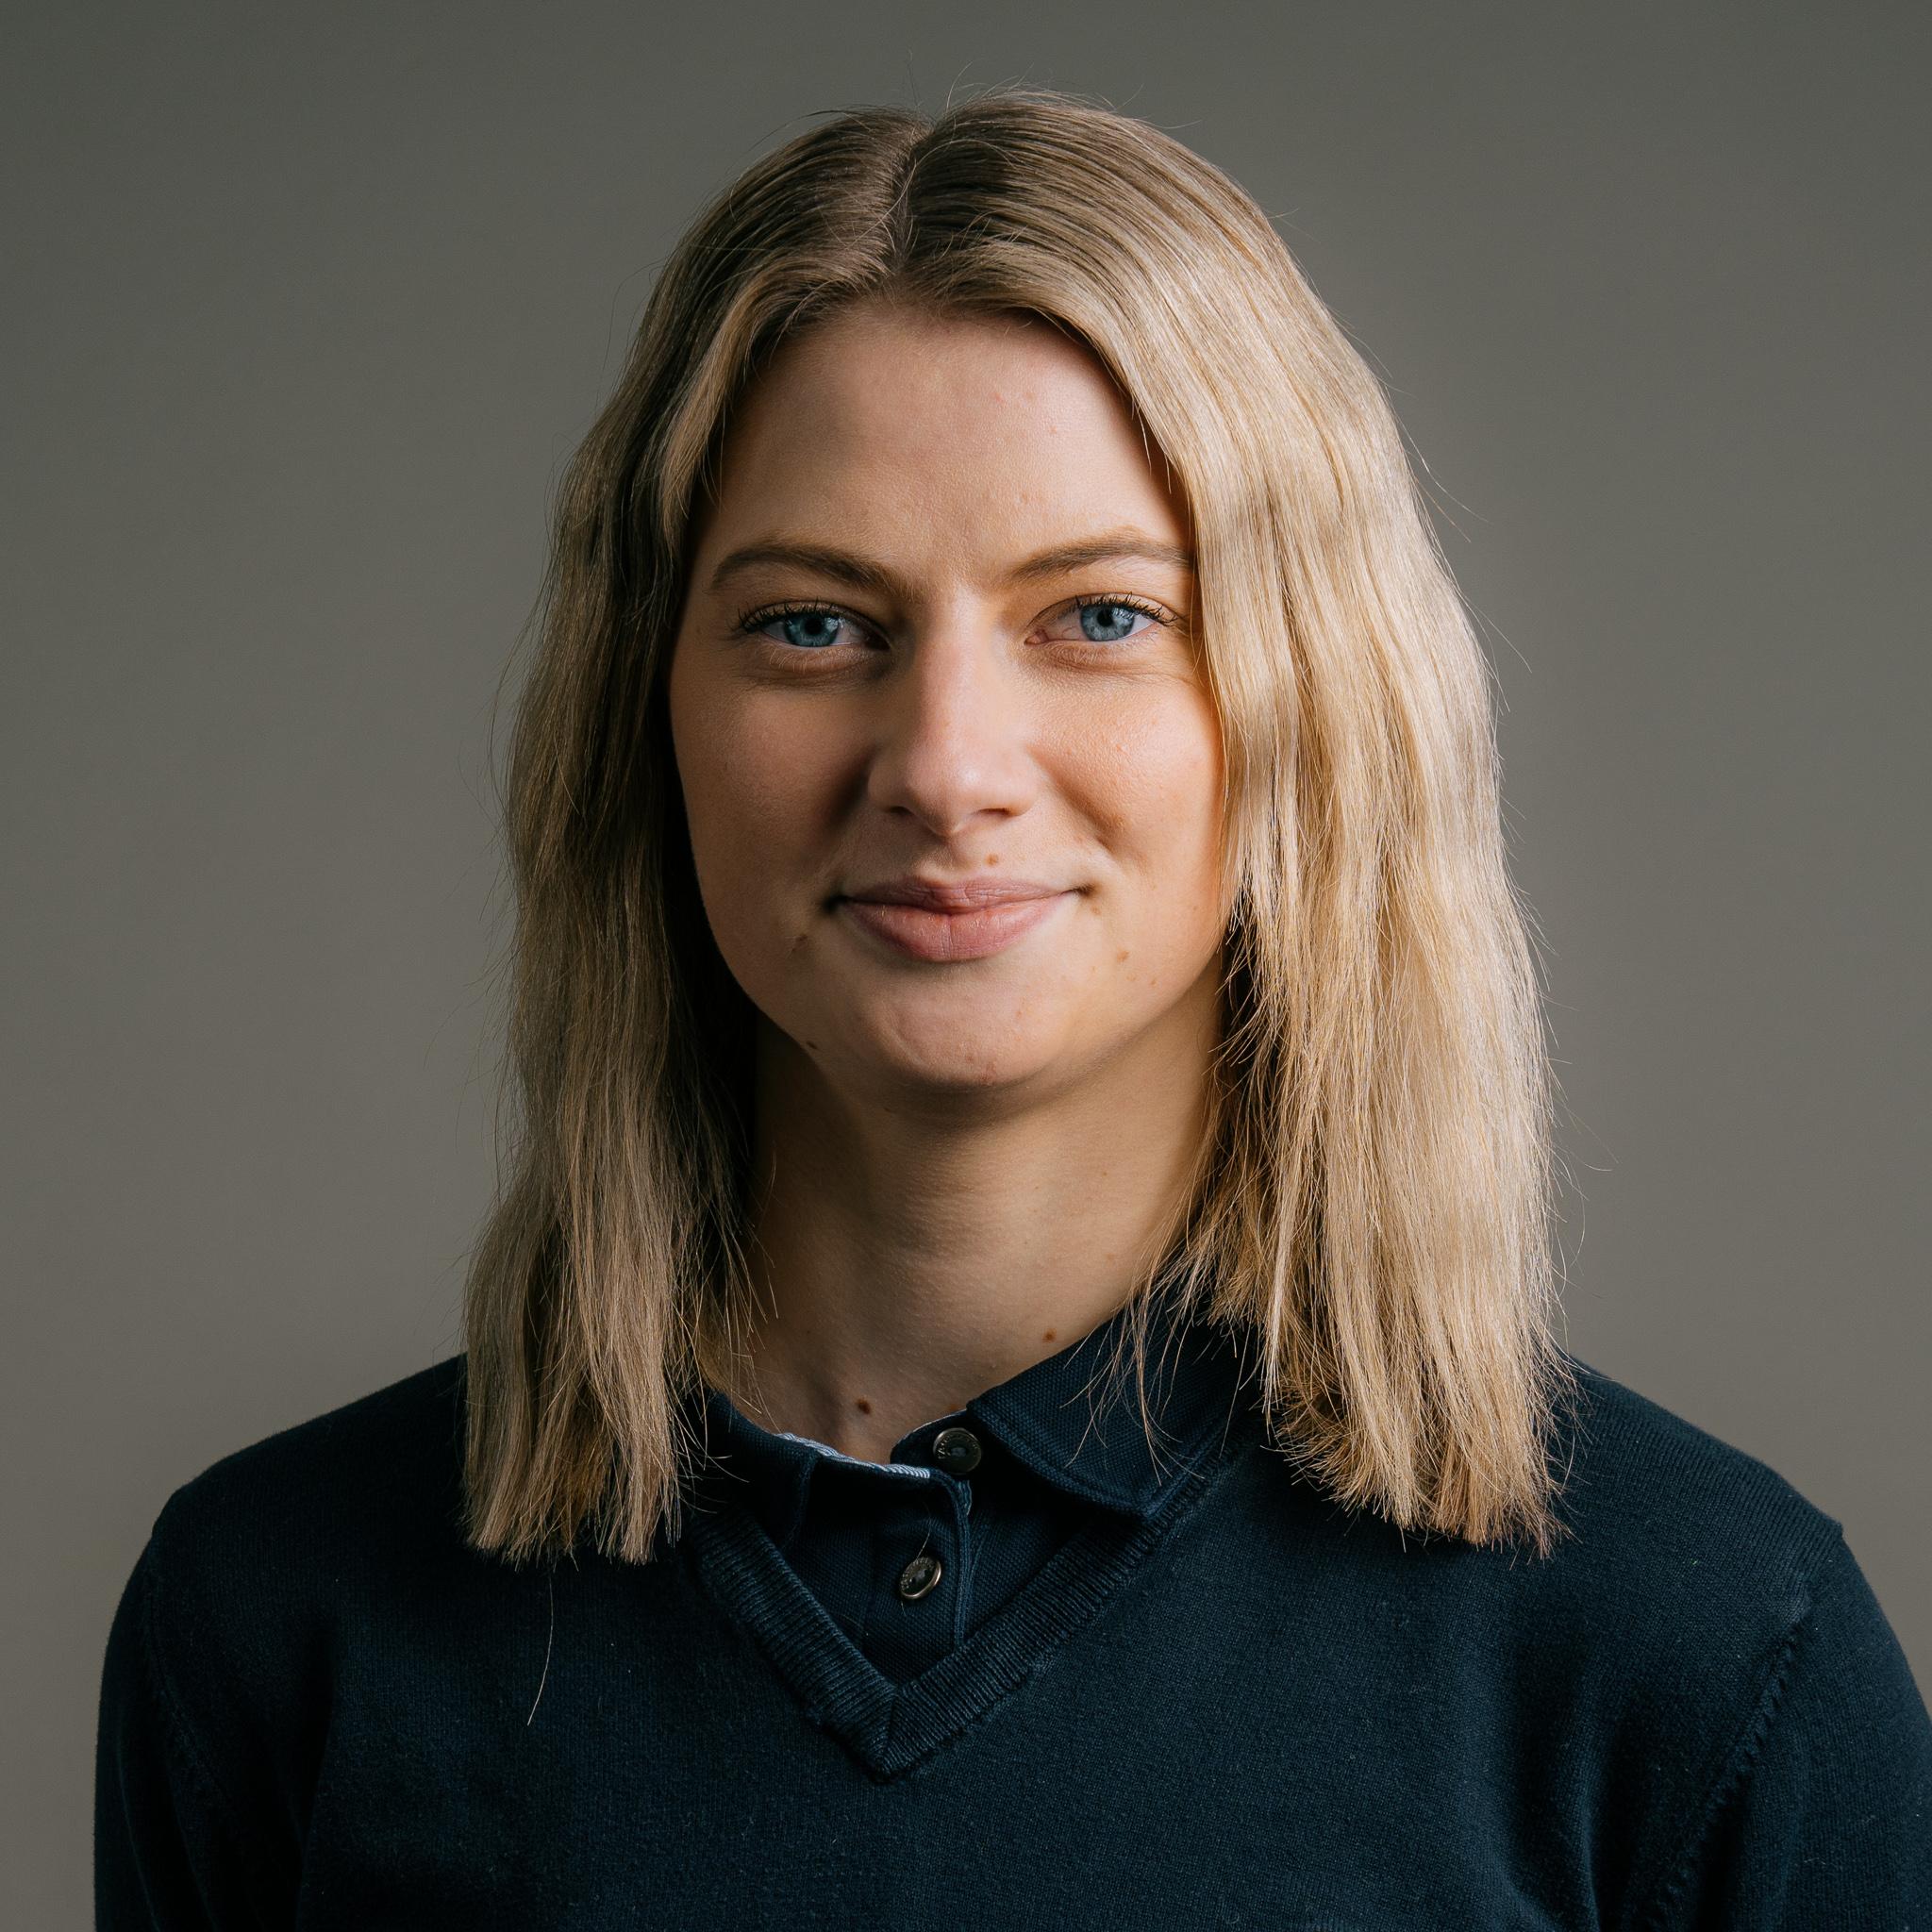 Amanda Jonsson